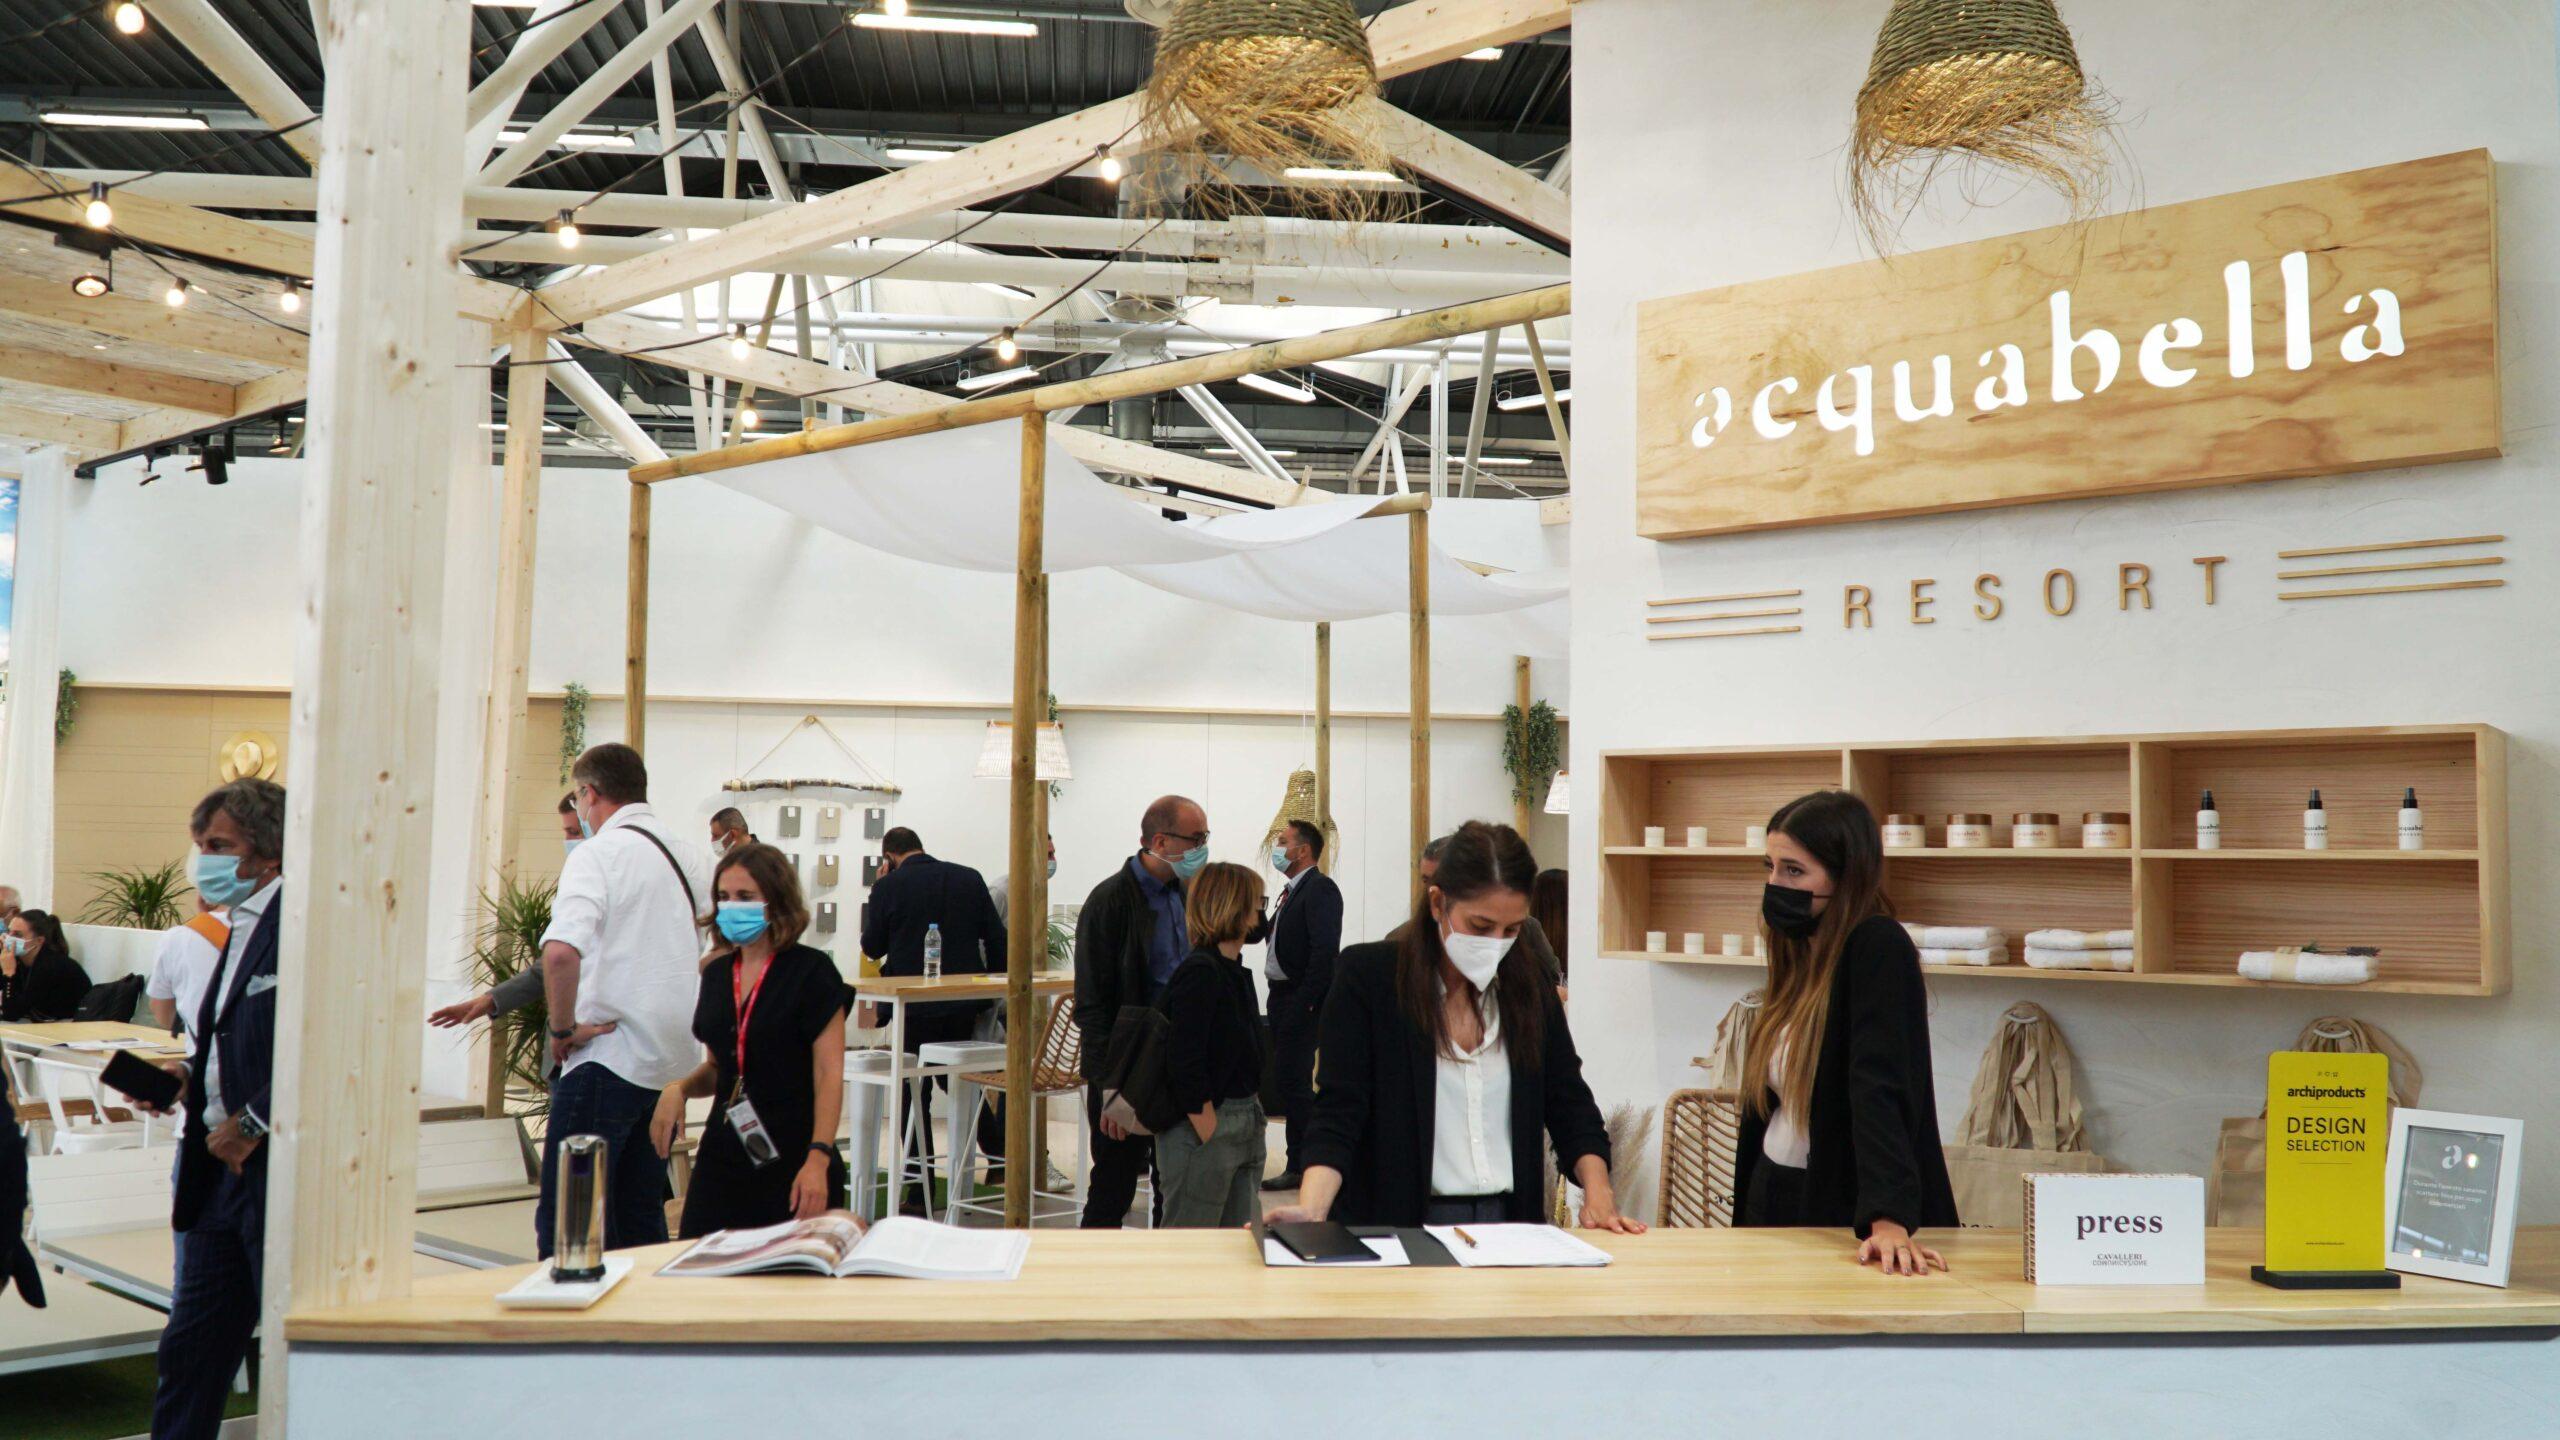 All eyes on Acquabella Resort at Cersaie 2021